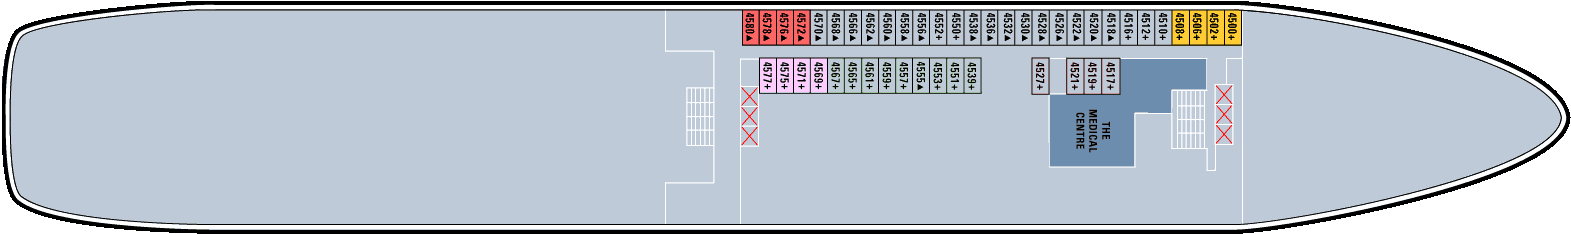 deck4